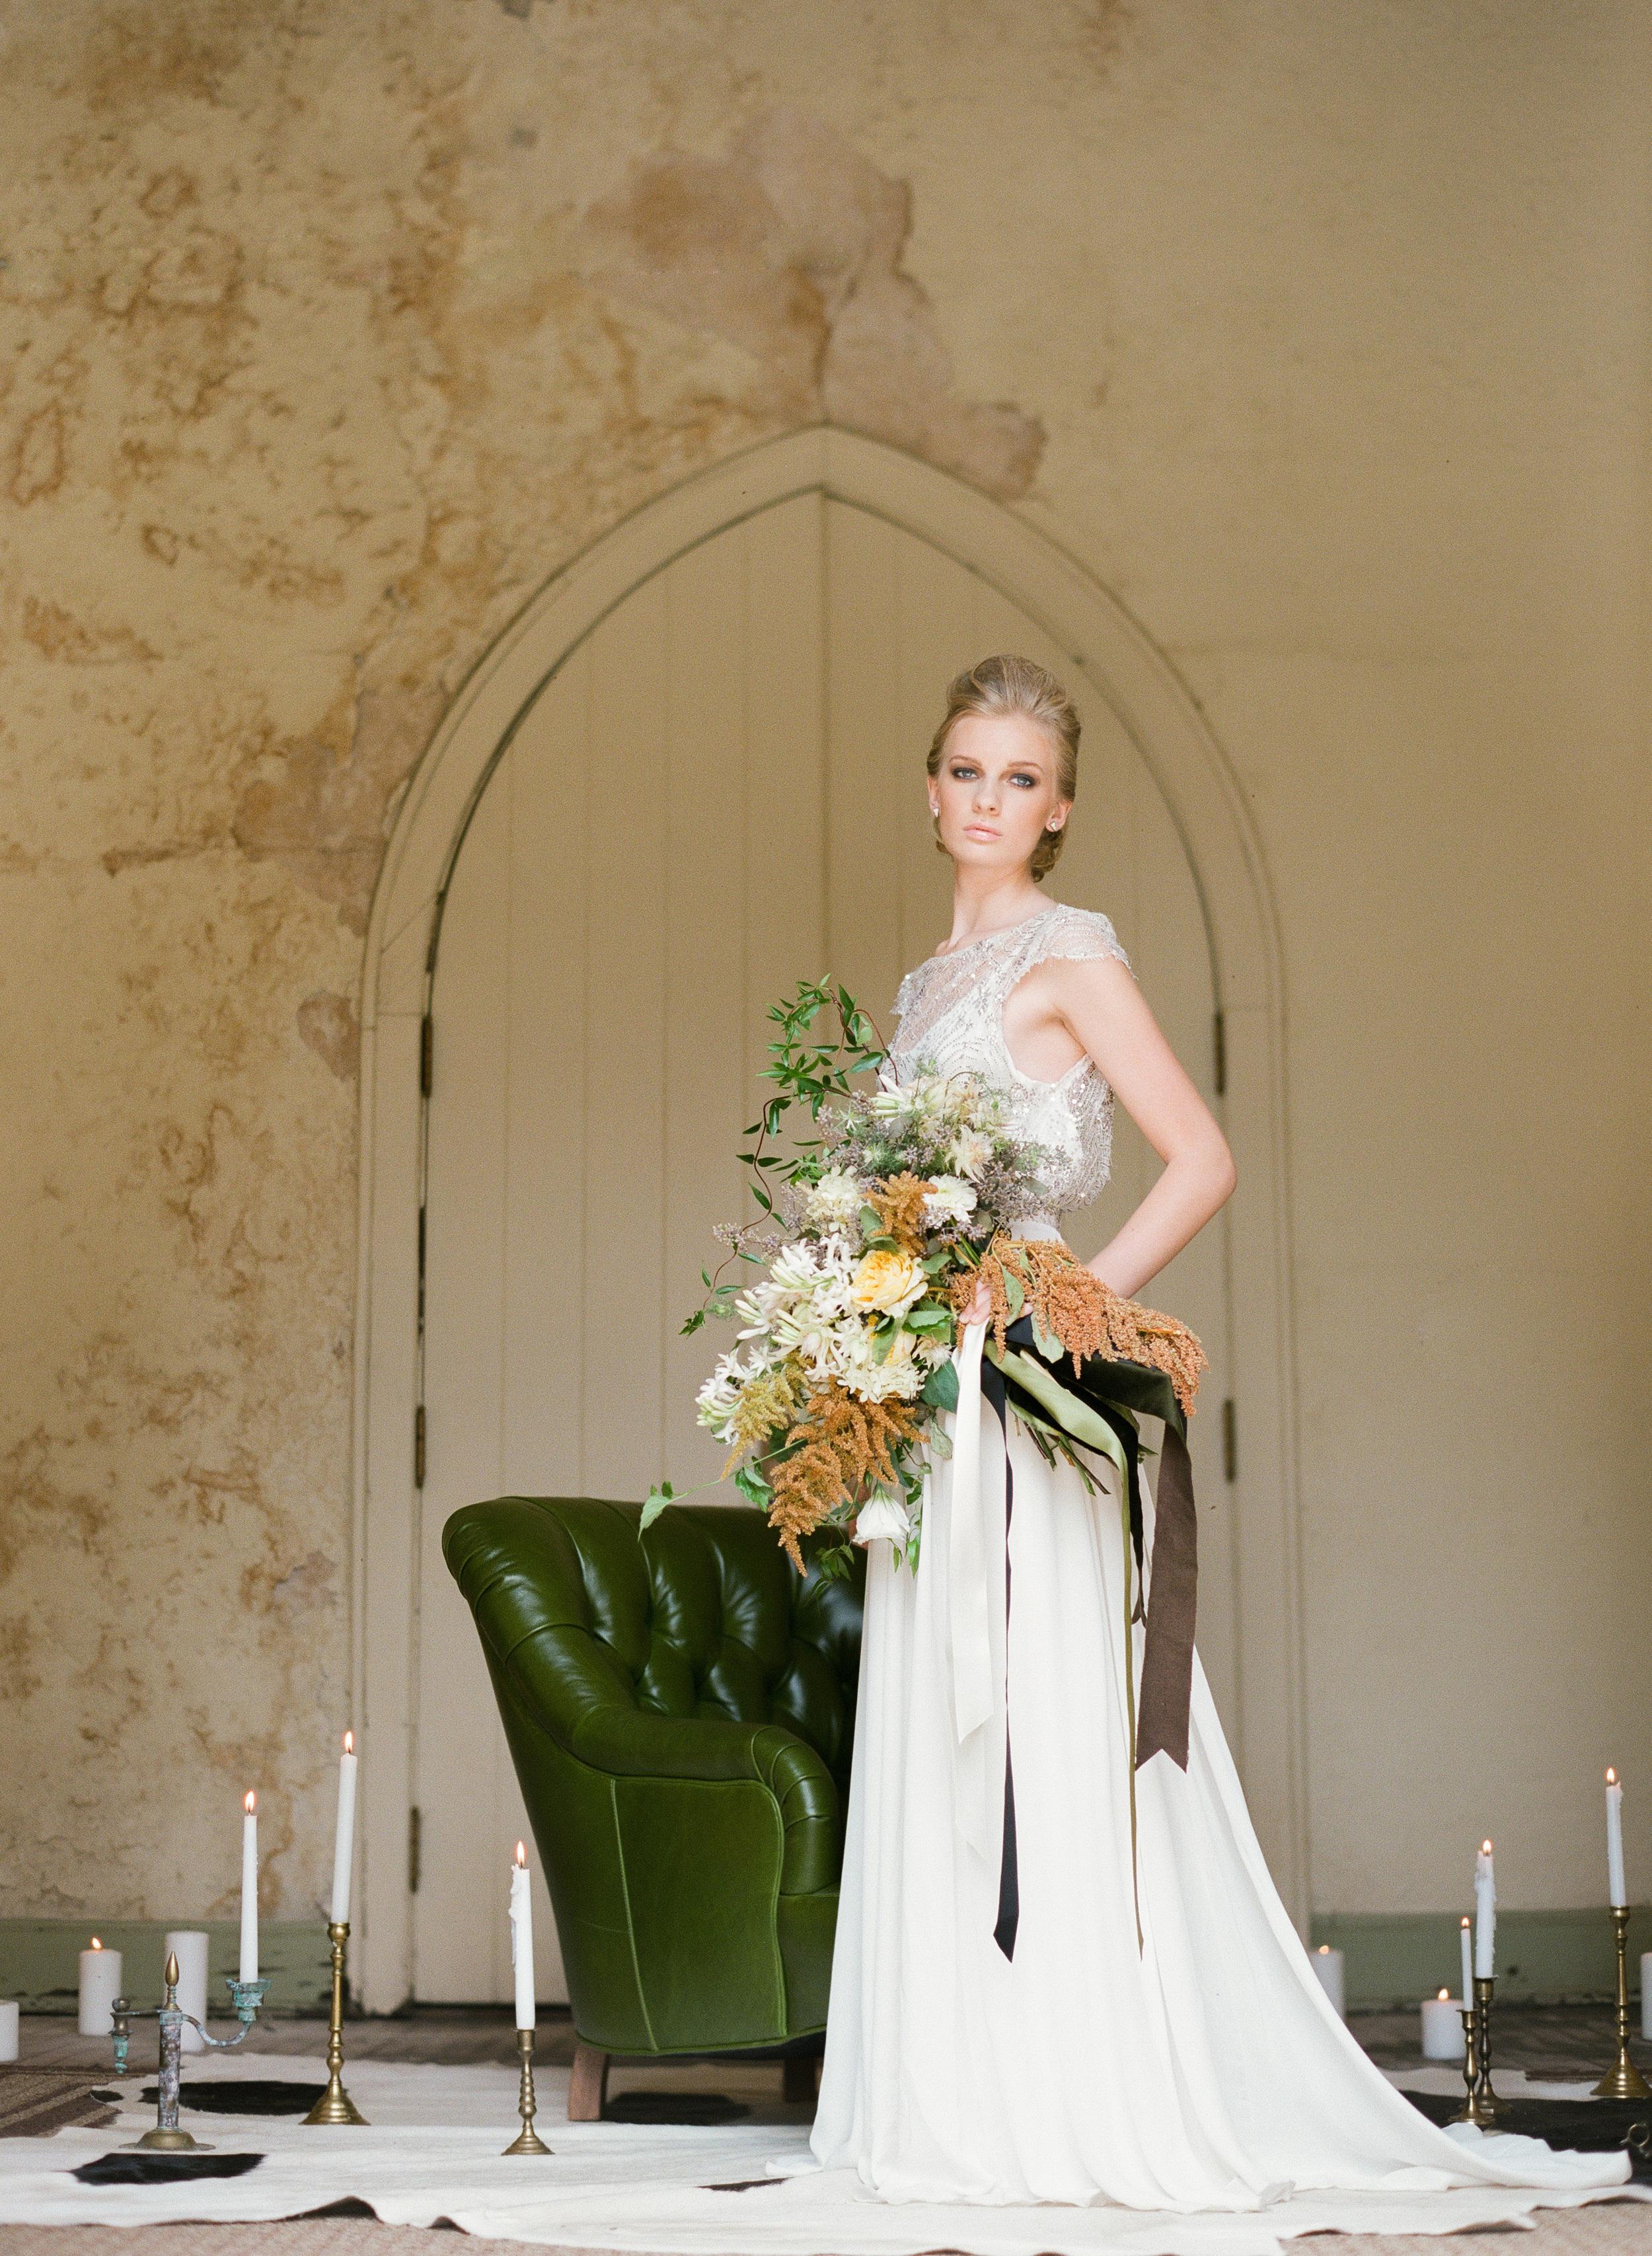 Olivia-Griffin-trendy-bride-magazine-willow-florals-sarah-seven-gwen-ivory-and-beau-bridal-boutique-savannah-wedding-dresses-savannah-bridal-boutique-savannah-wedding-savannah-bridal-gowns-savannah-wedding-planner-georgia-bridal-boutique-5.JPG